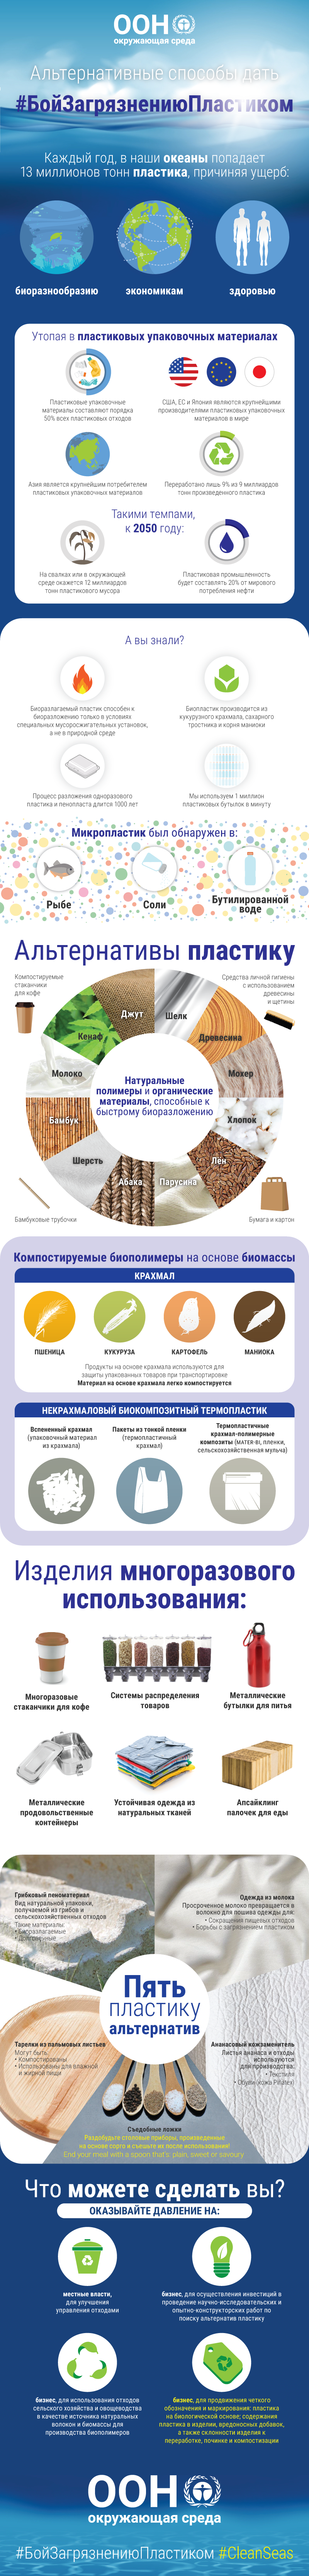 RU_PlasticeAlternatives_Infographic.png